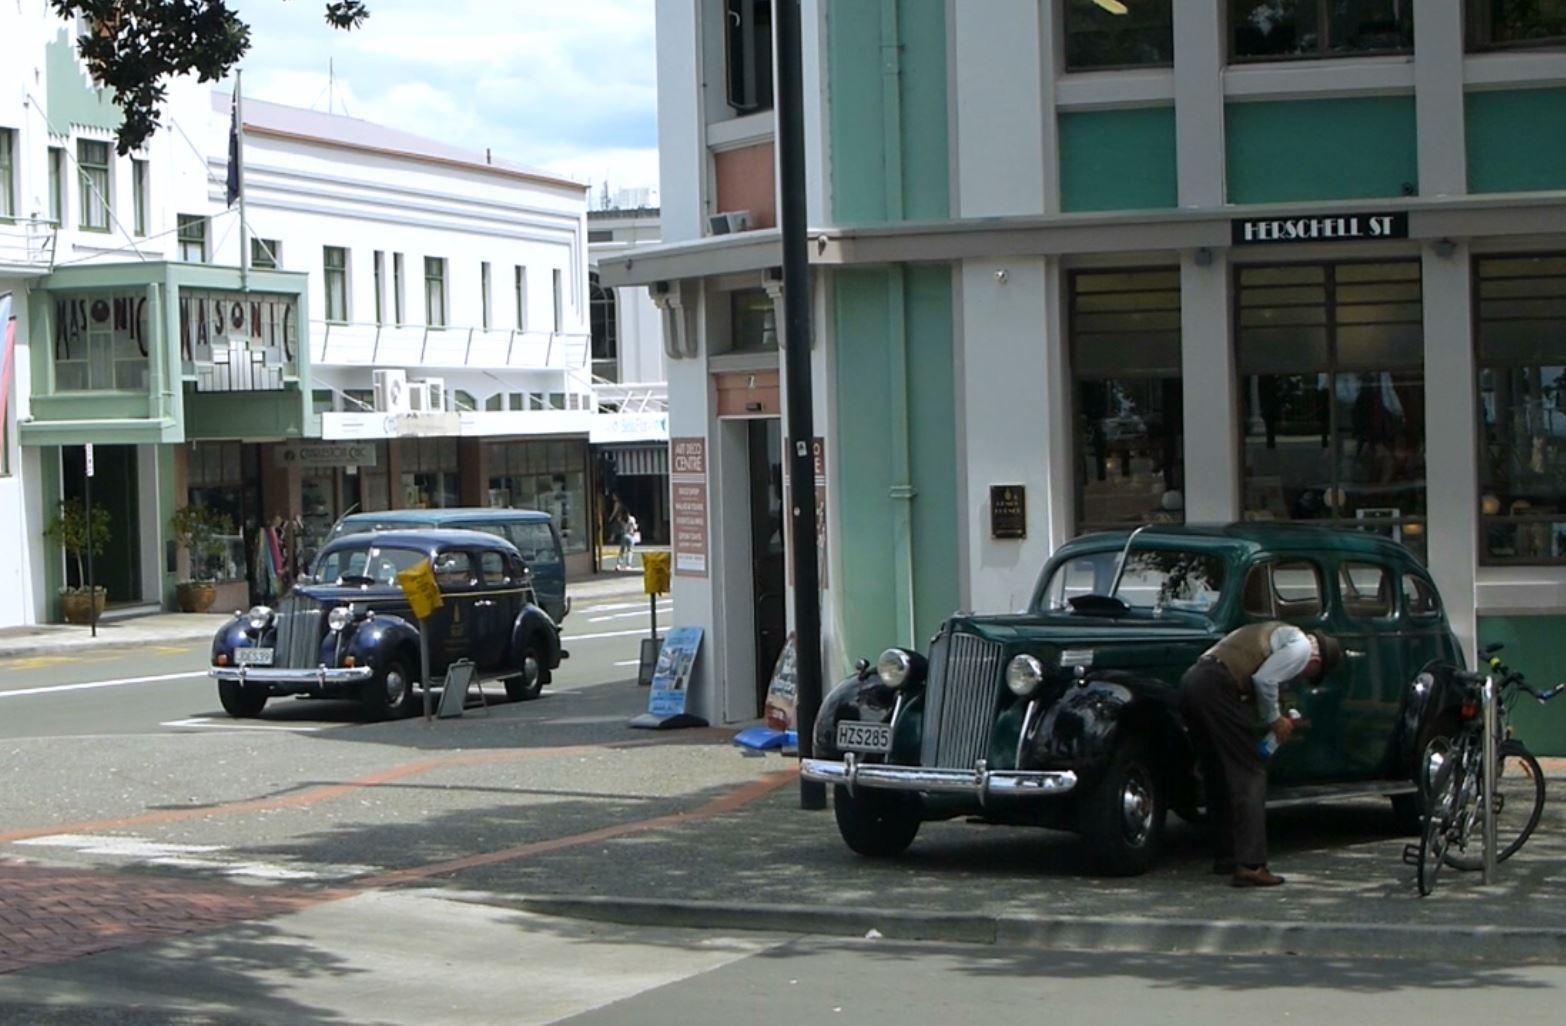 Weit weg Reisen, Napier, Art Deco City 2